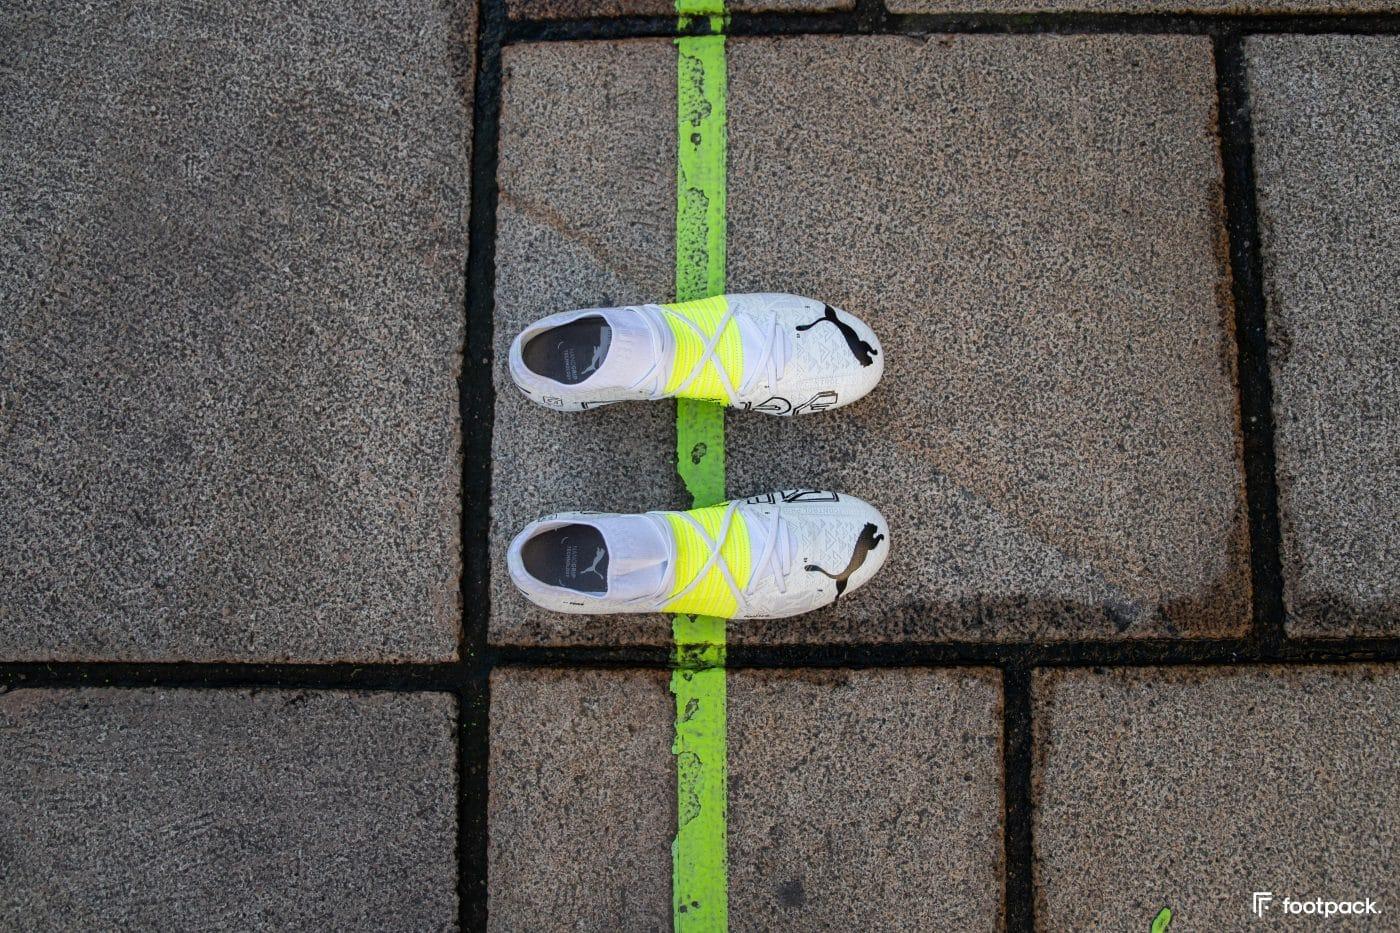 puma-future-z-teaser-edition-shooting-footpack-9